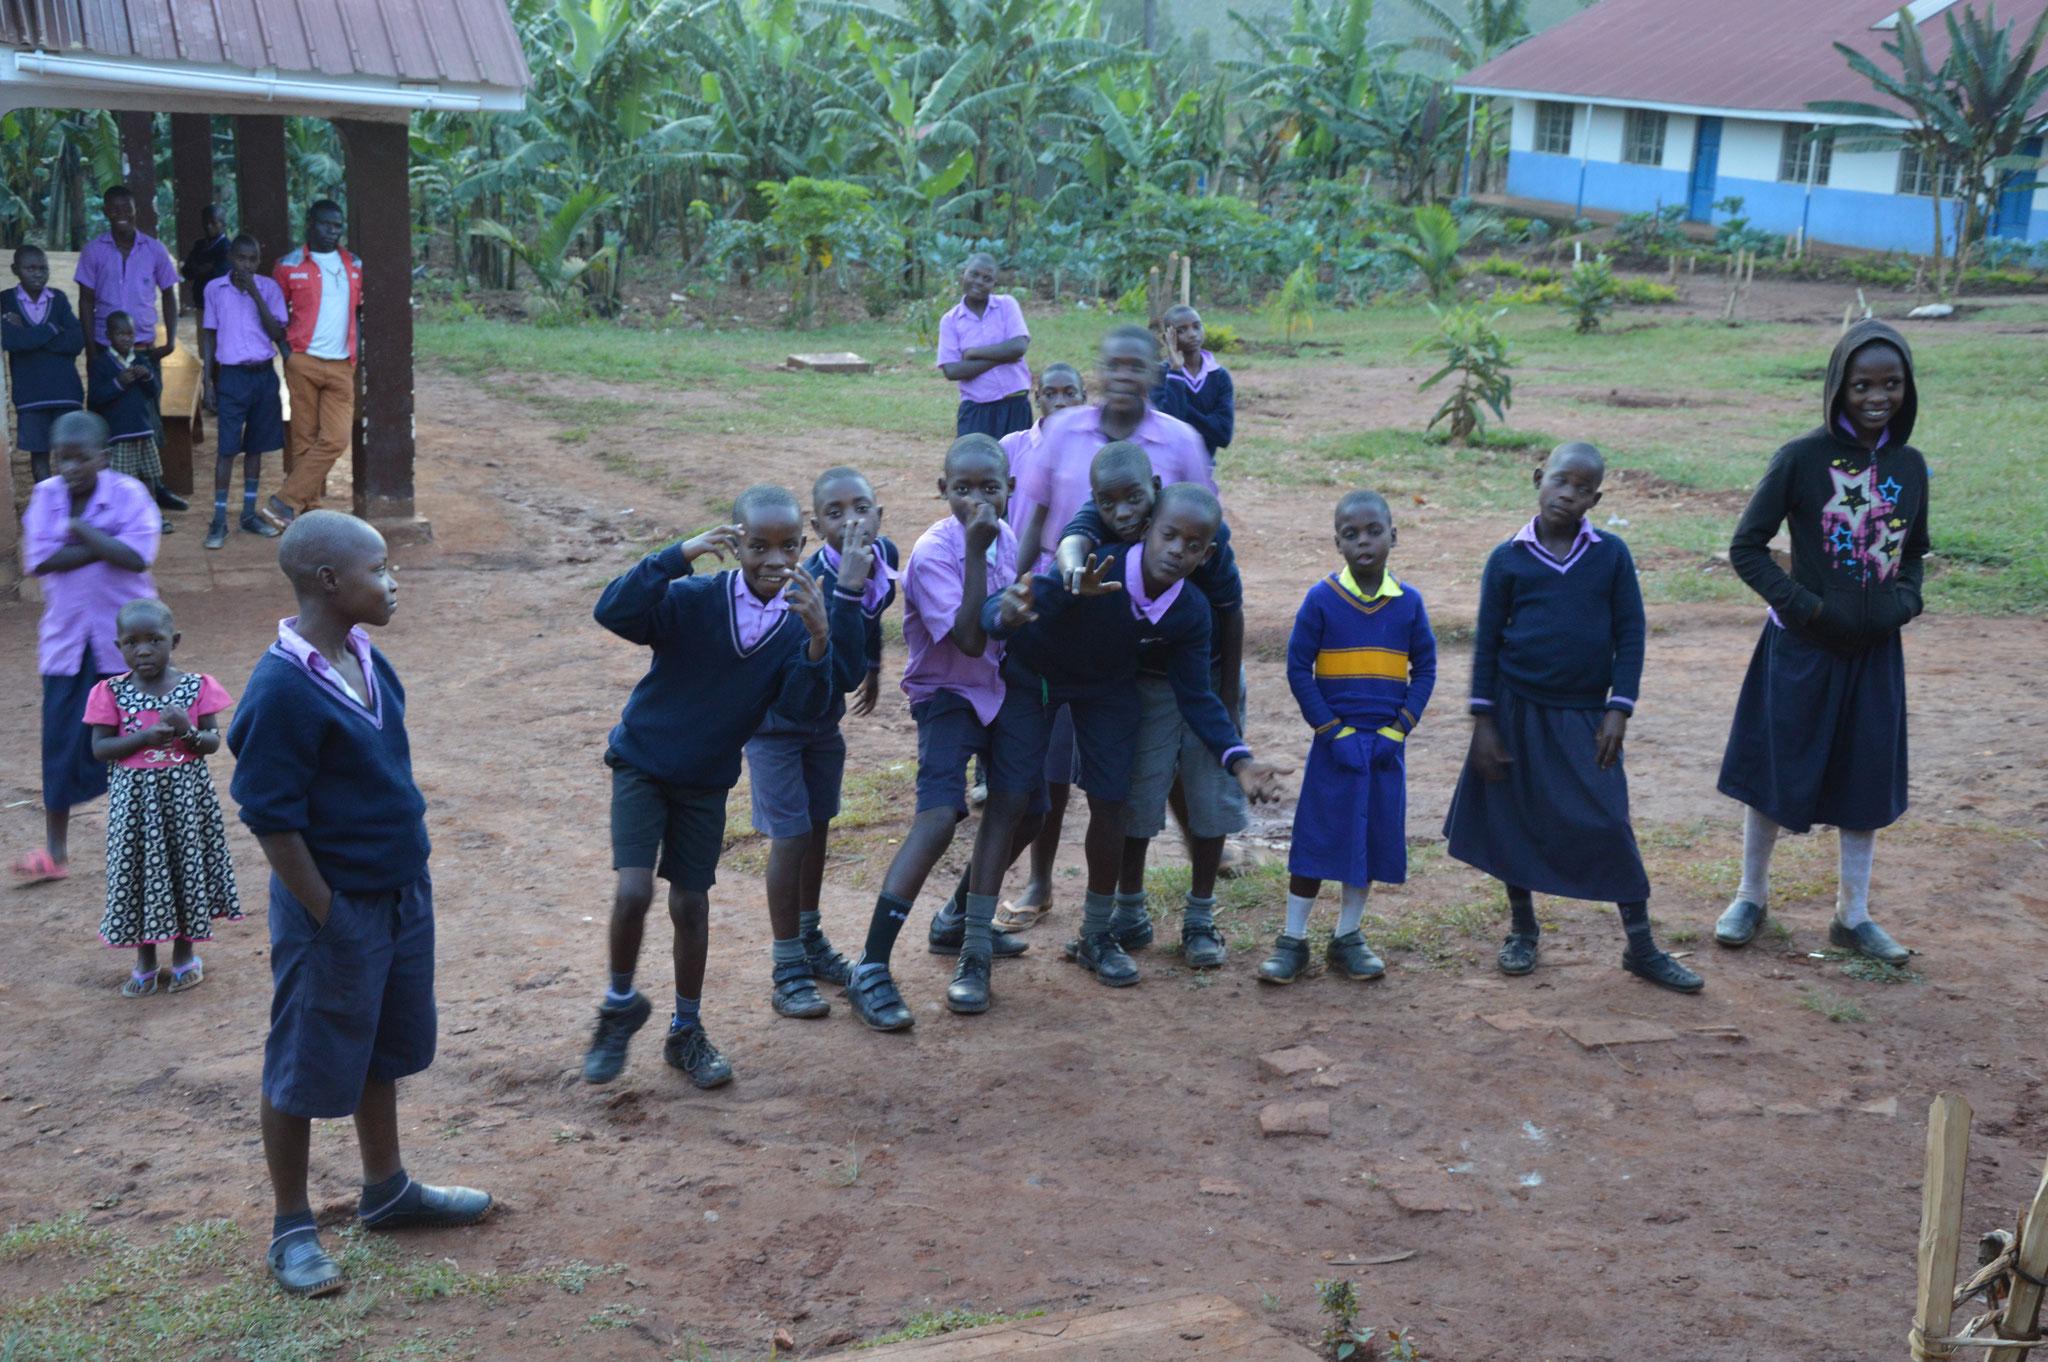 Kinder in Ntungamo